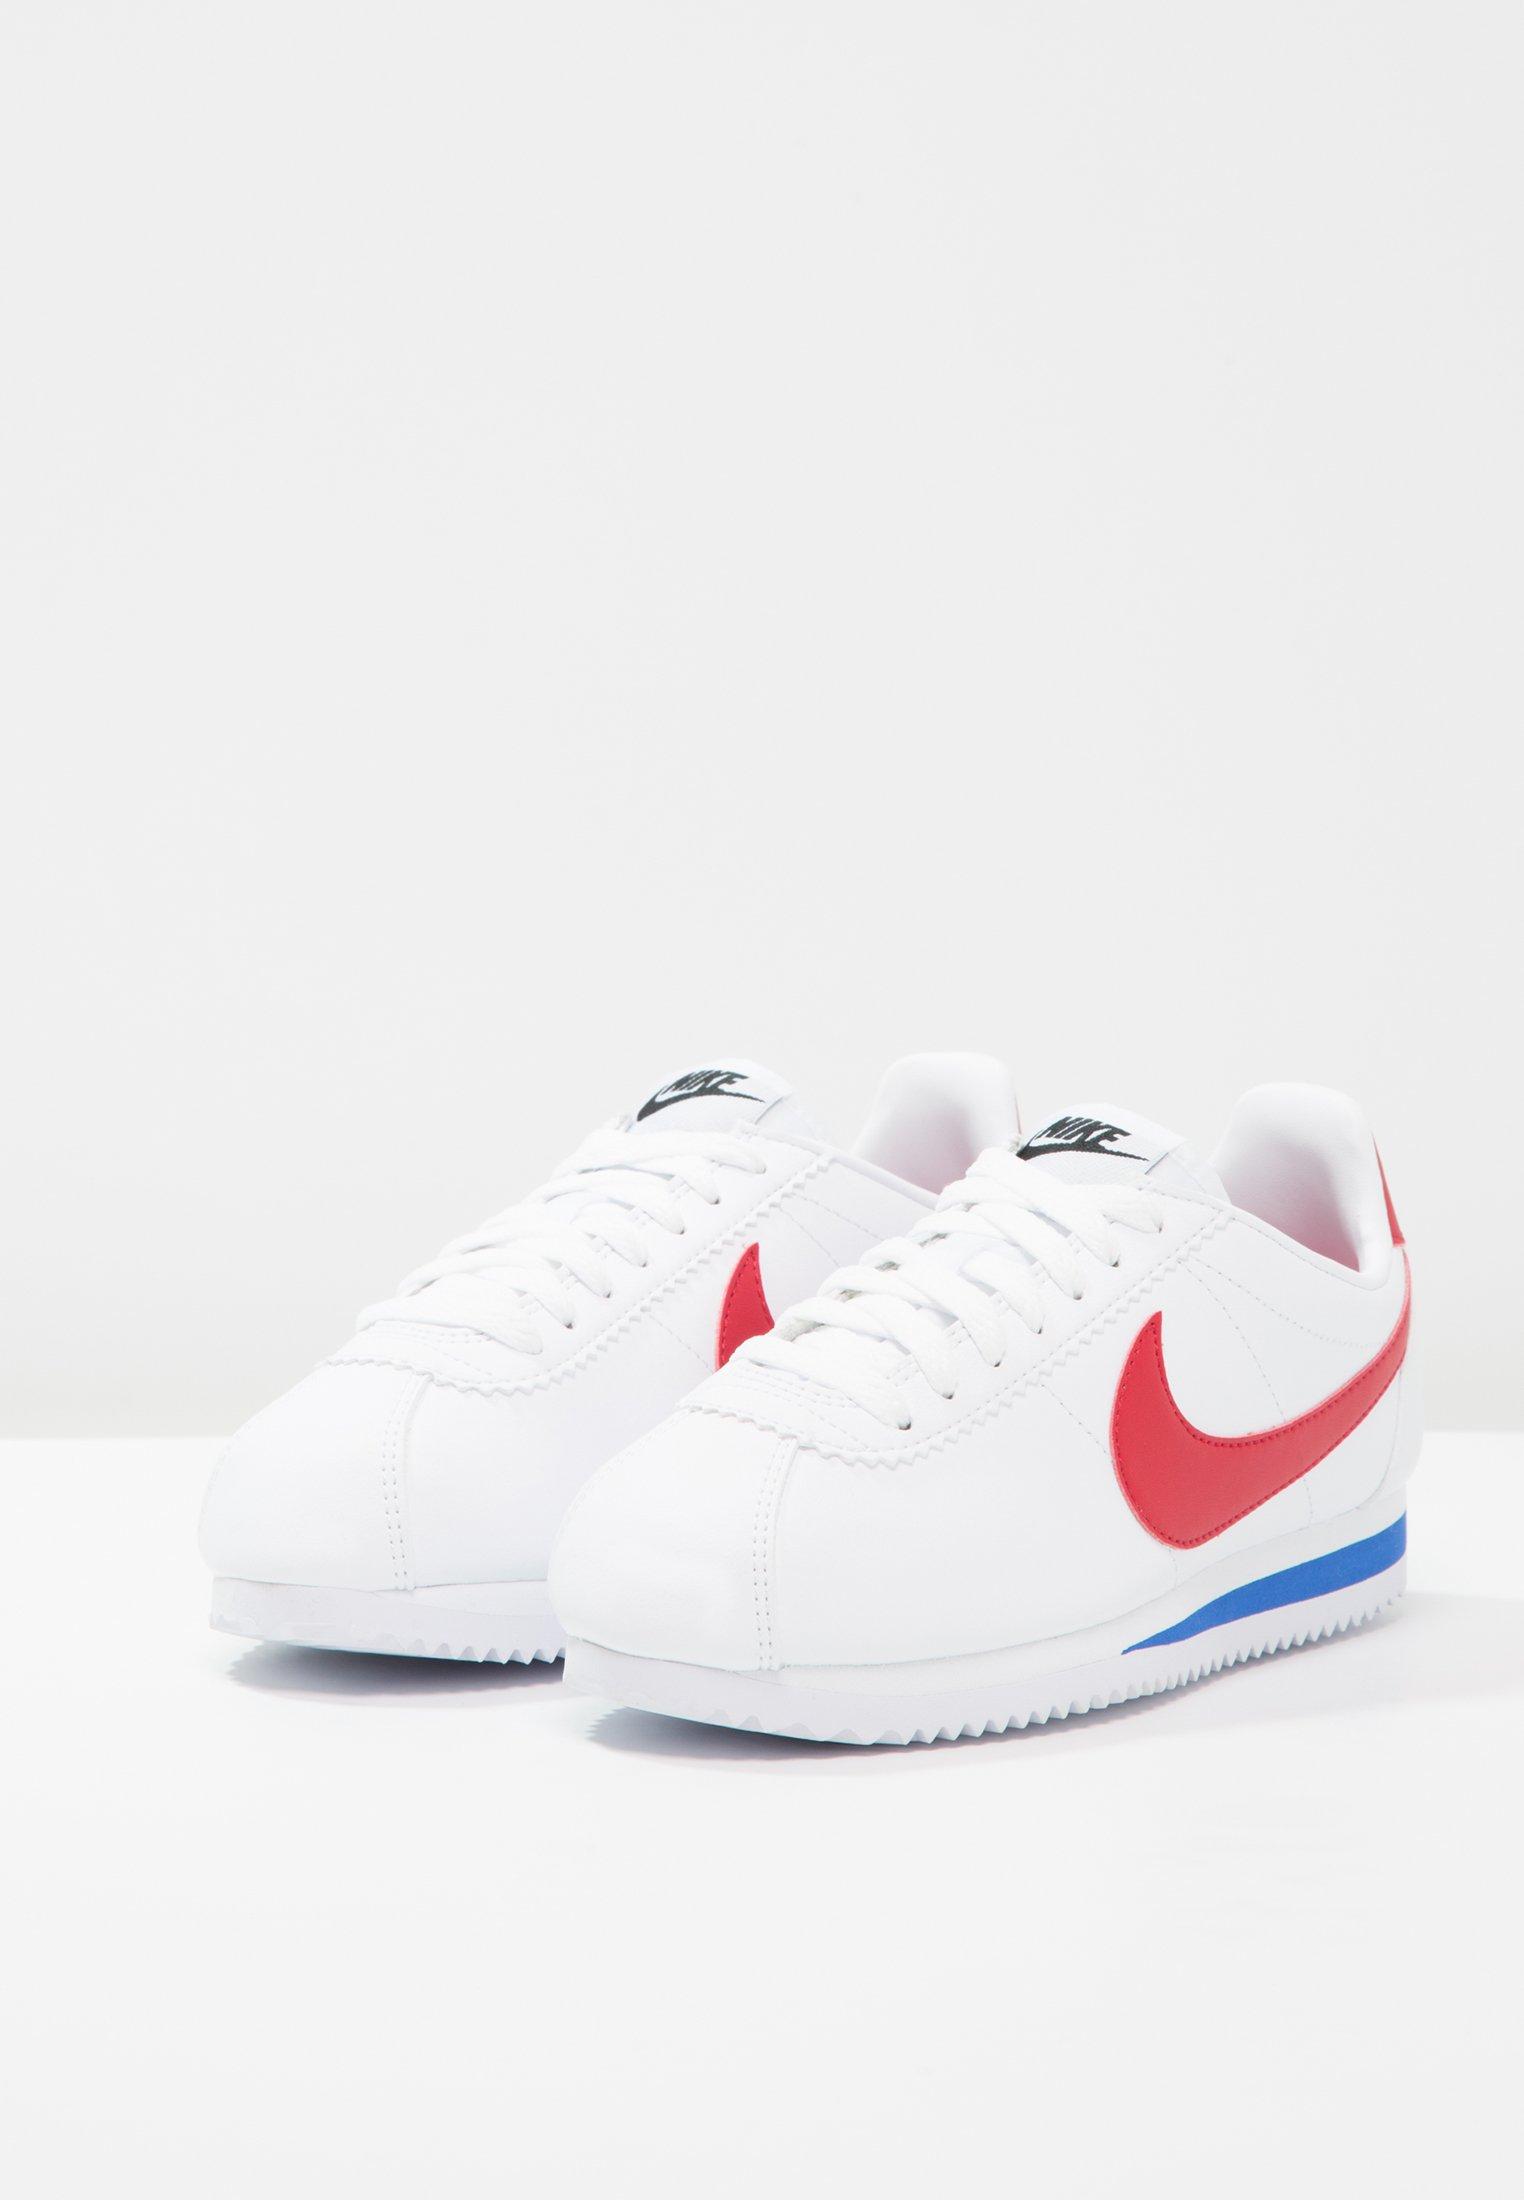 Sportswear Cortez Red Classic Royal Basses varsity LeatherBaskets White varsity Nike lFKcT351Ju